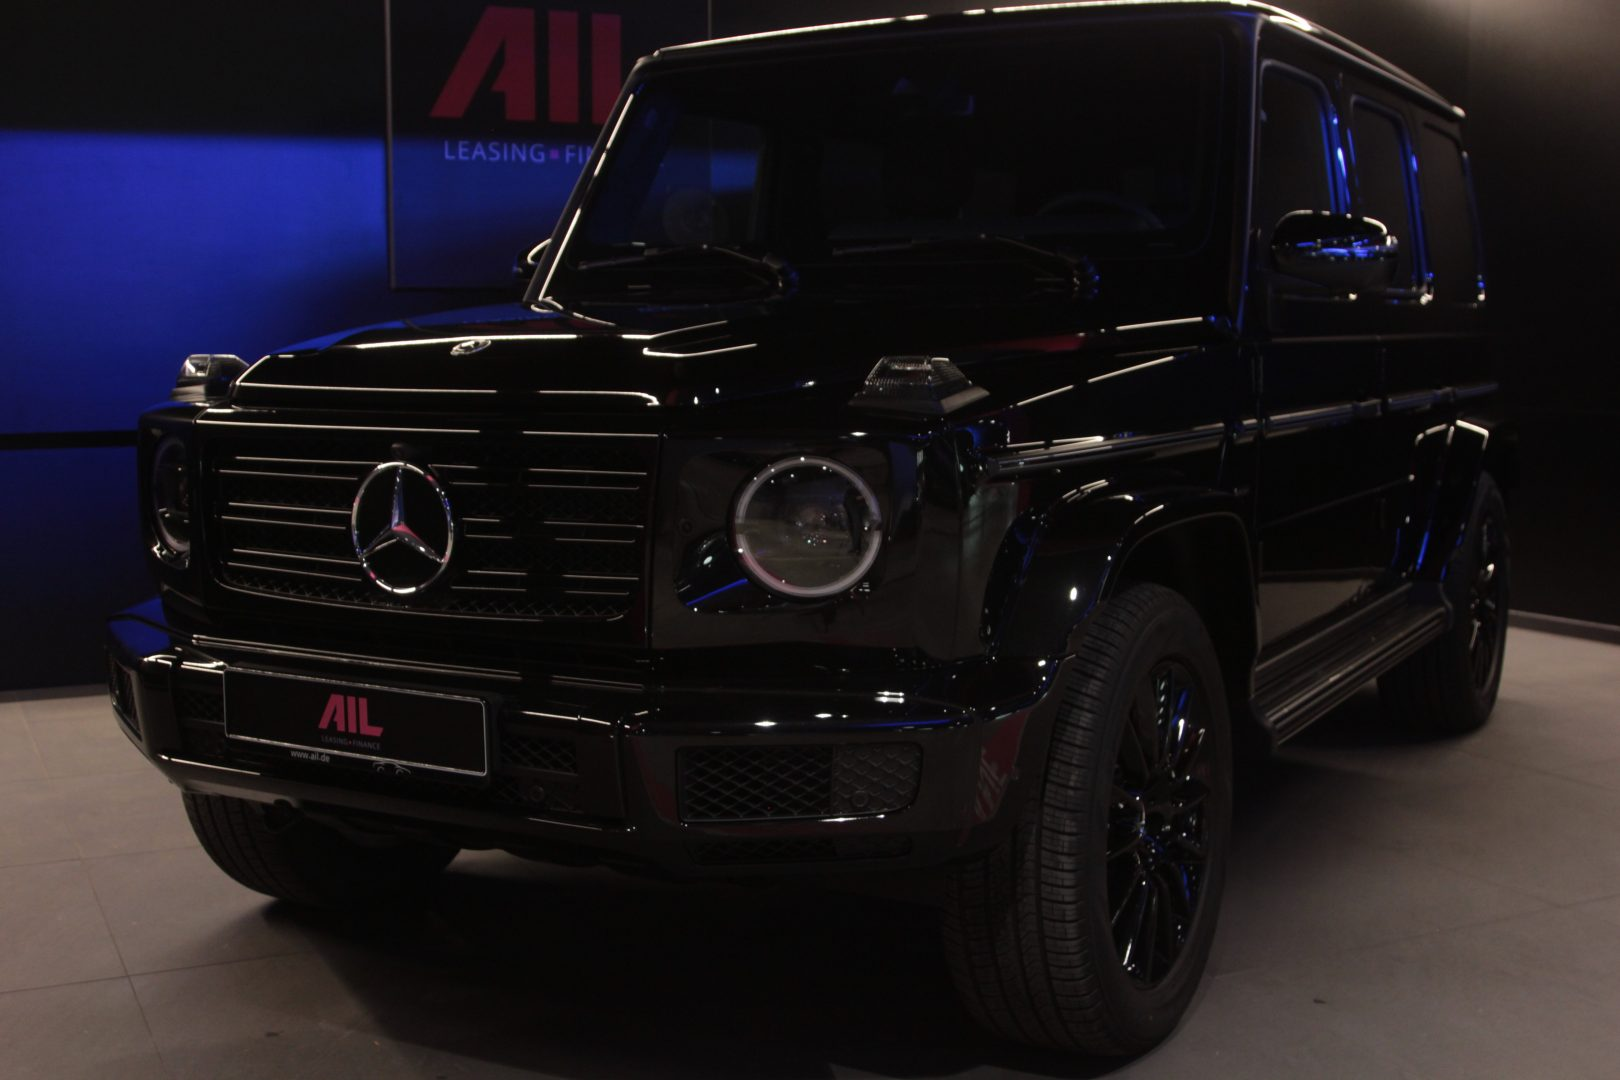 AIL Mercedes-Benz G 400 d Stronger than time Edition 6